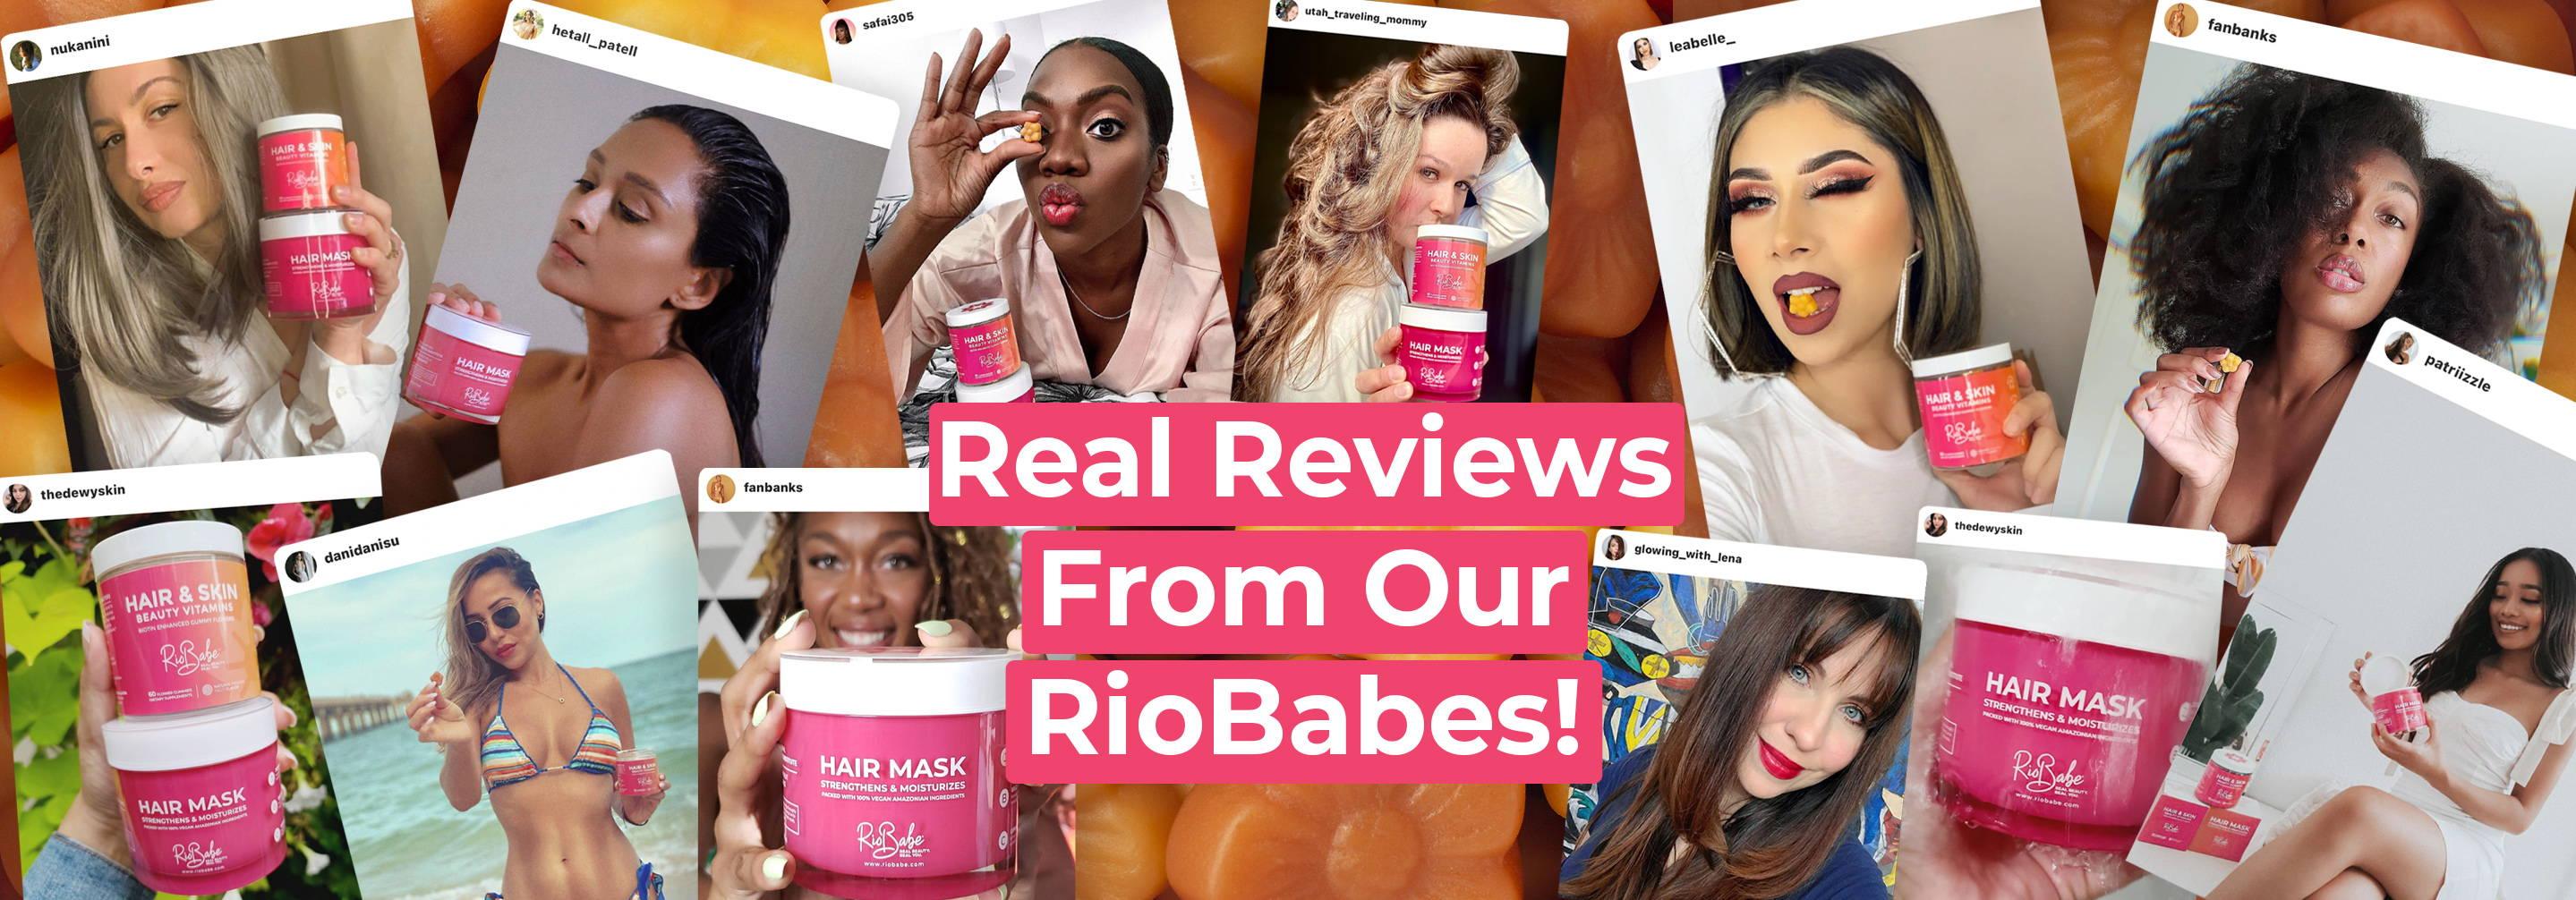 RioBabe real results and real reviews